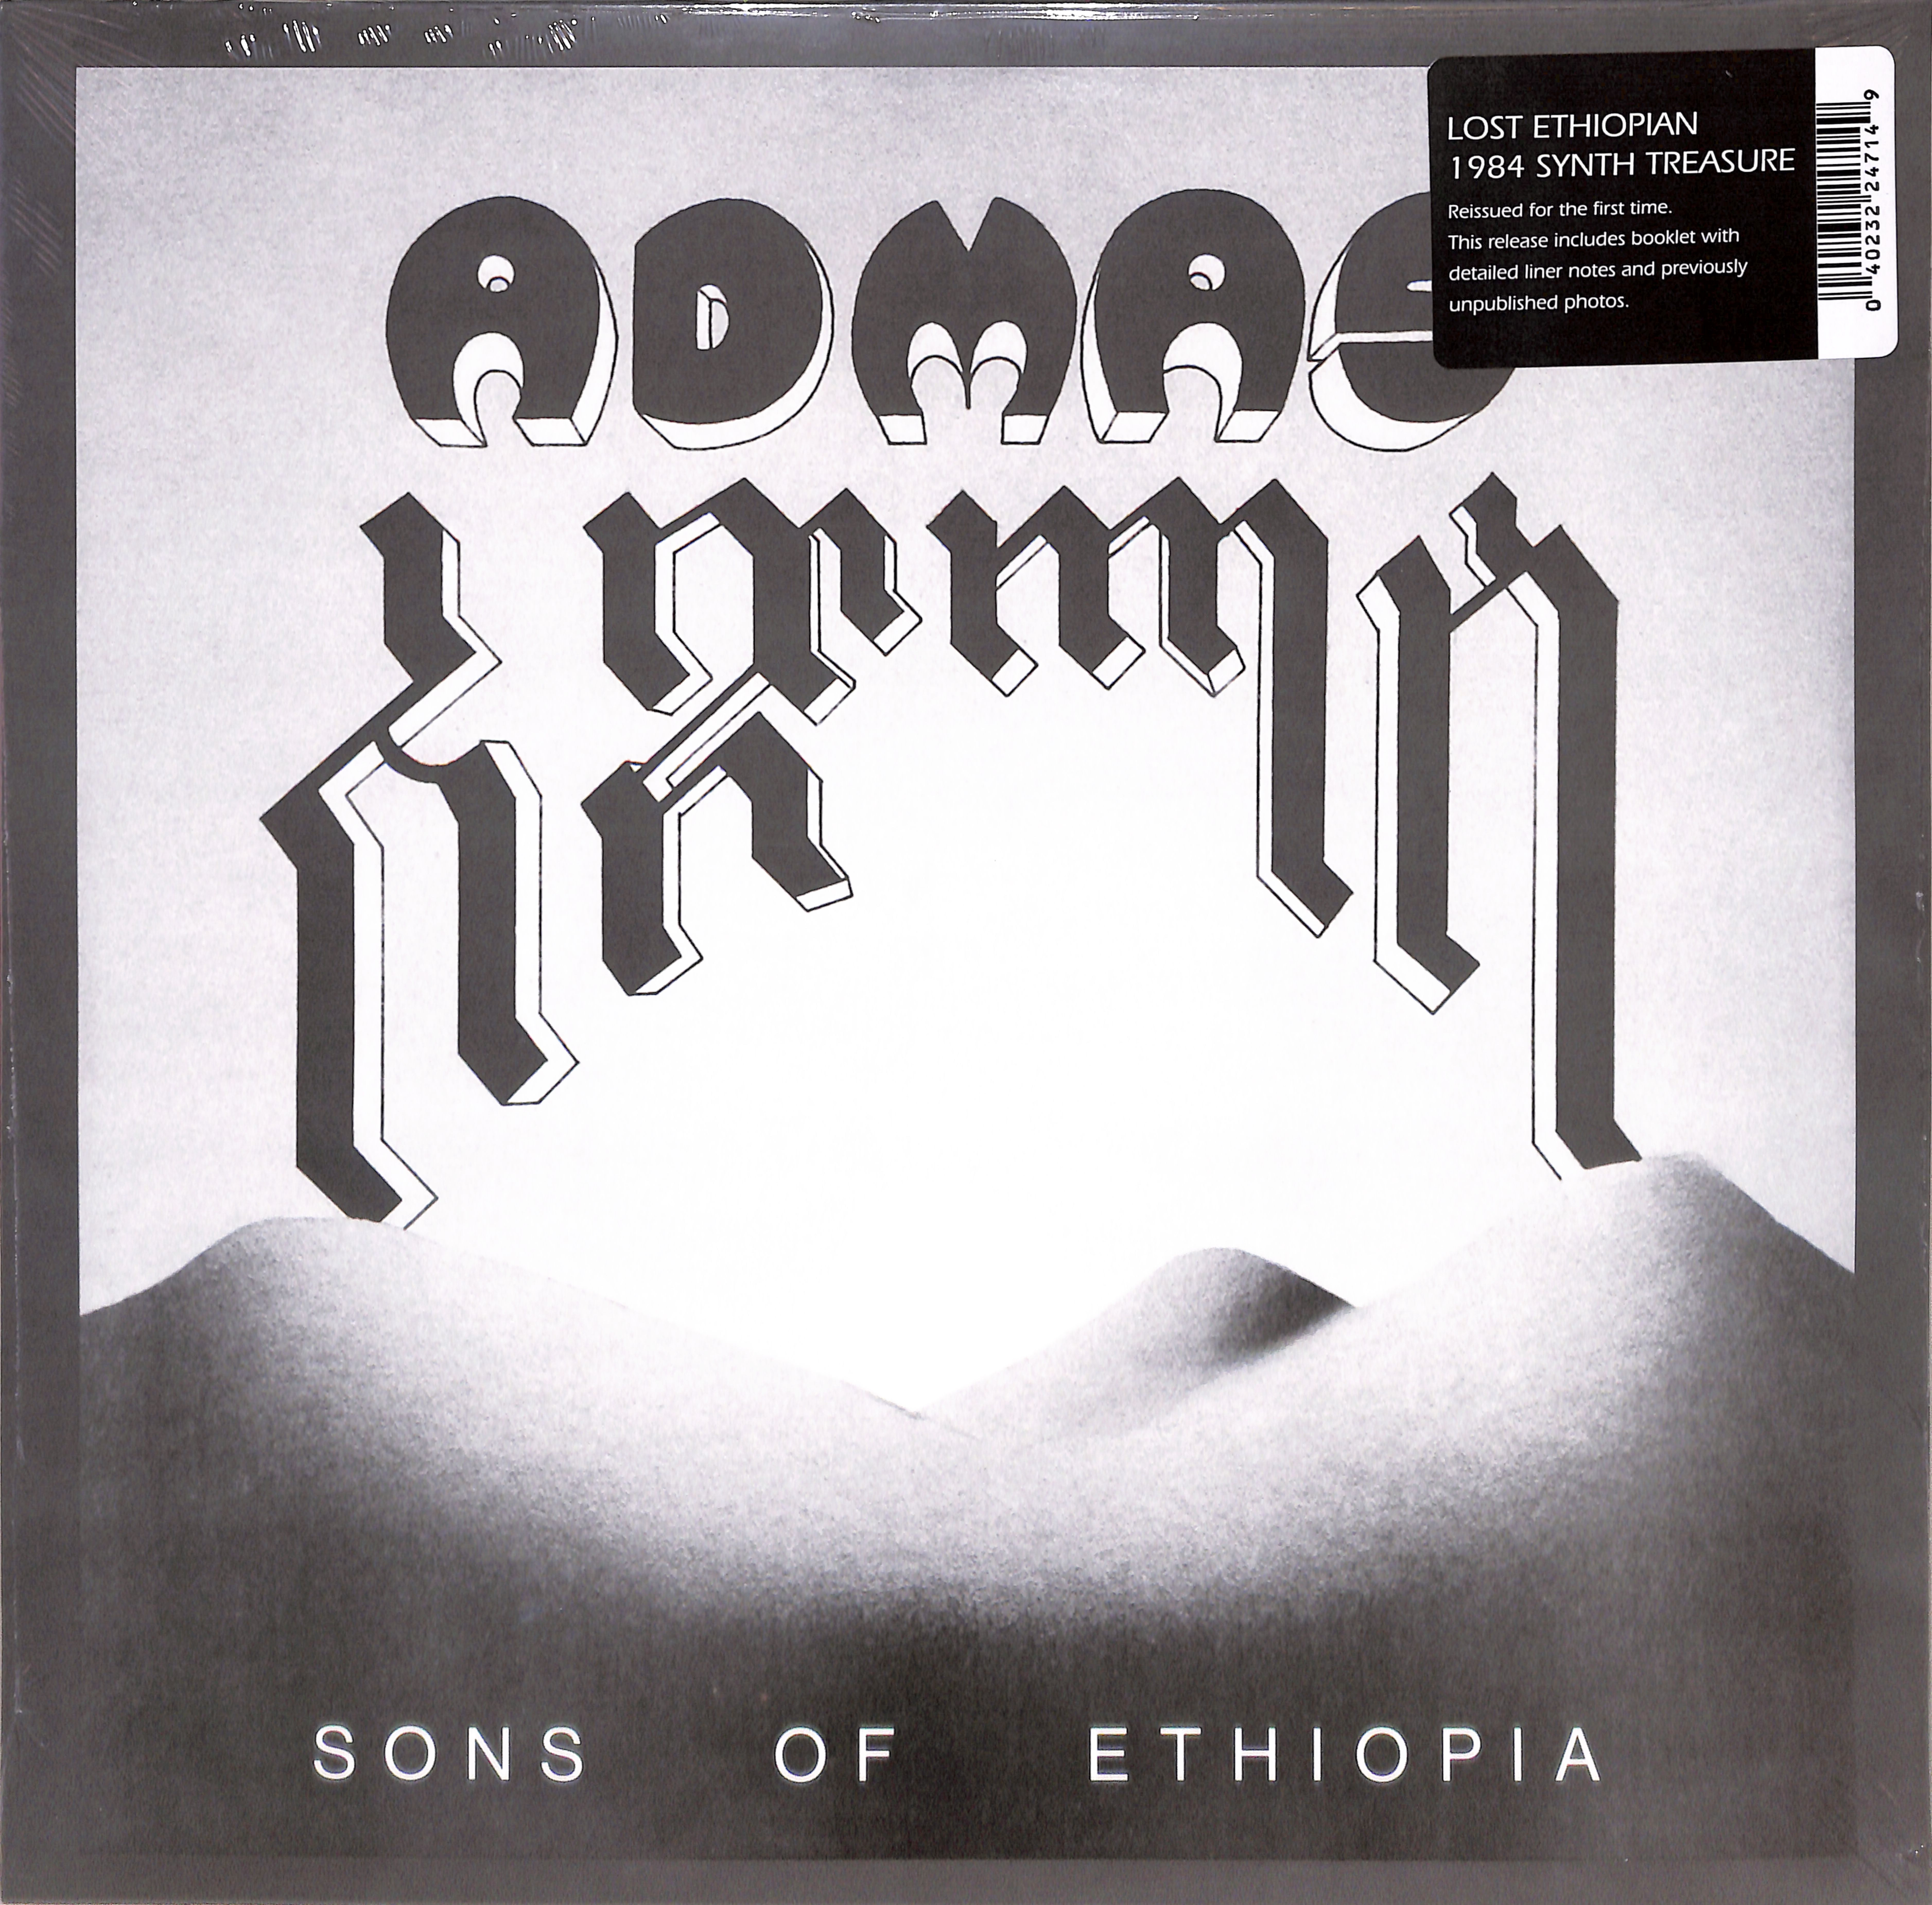 Admas - SONS OF ETHOPIA